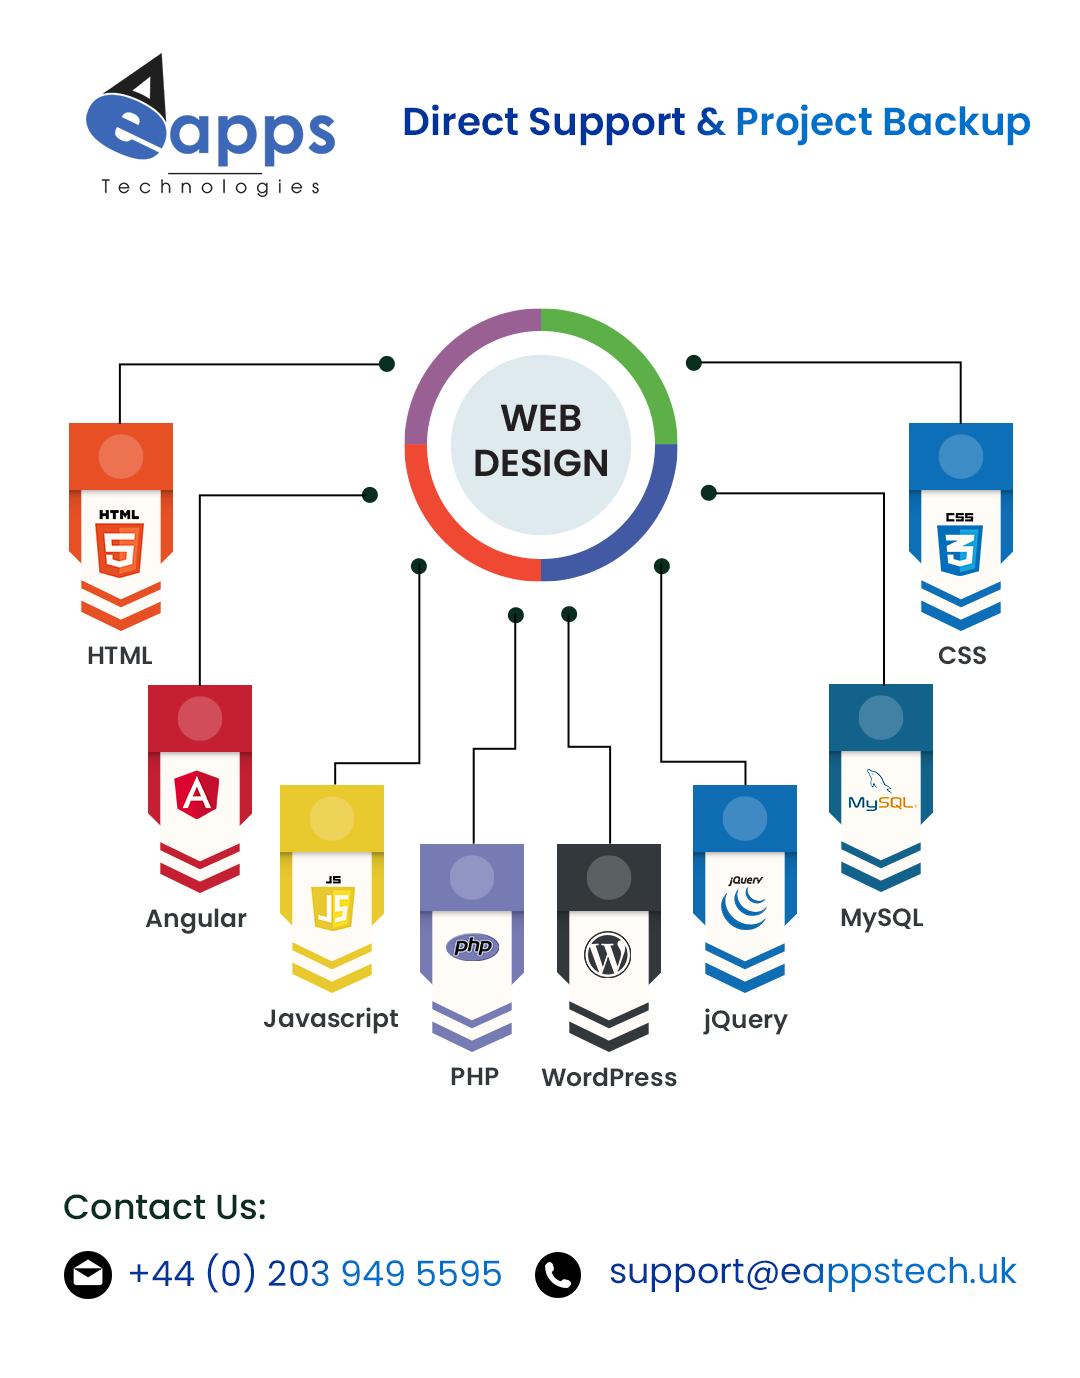 webdesign html angular javascript php wordpress